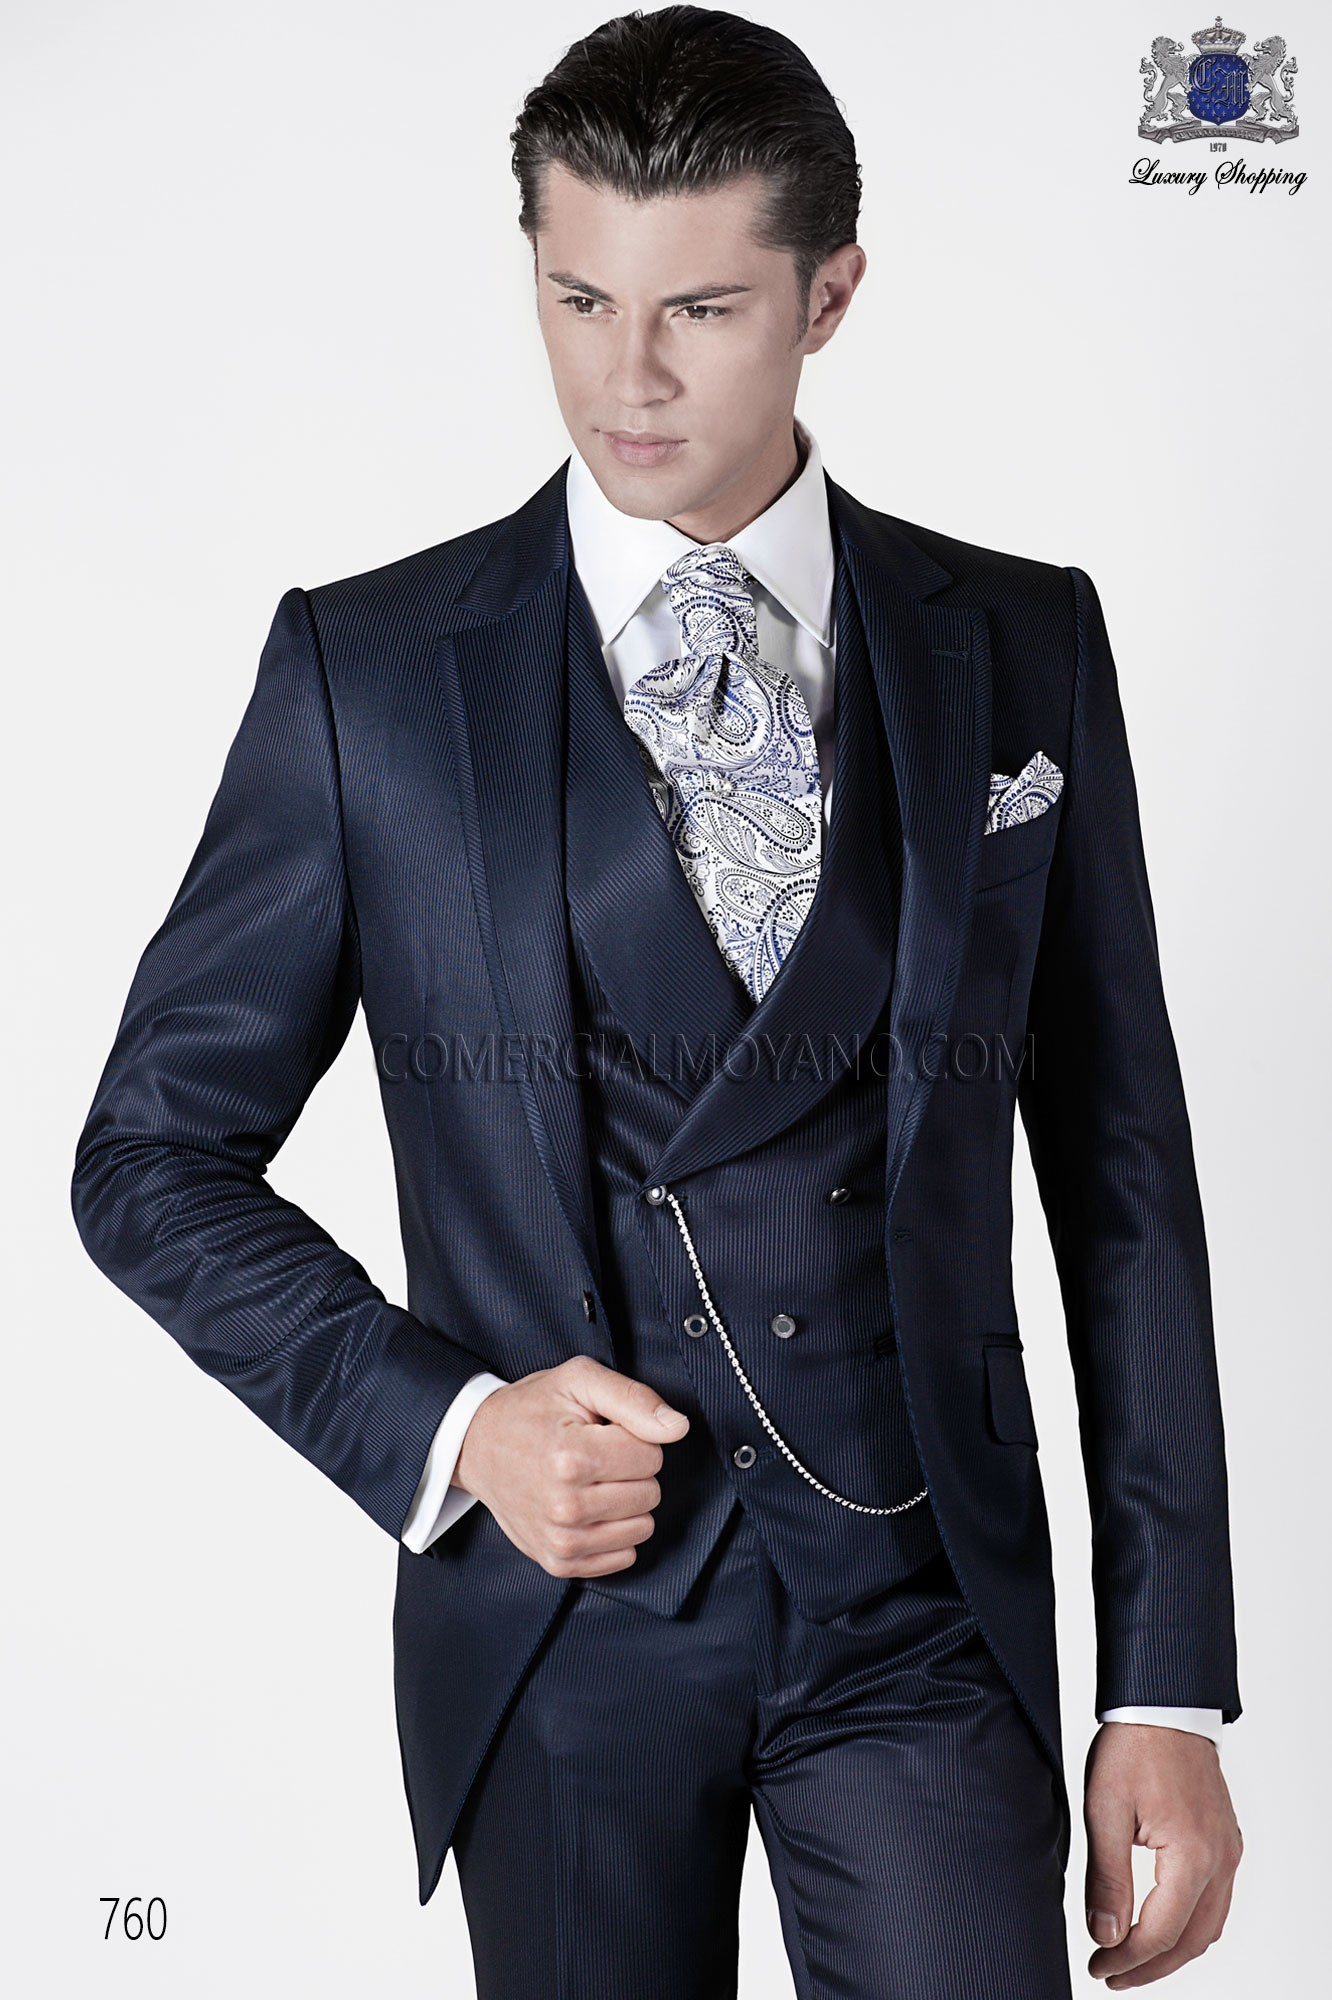 schwarzen kurzen kleid bräutigam-anzug